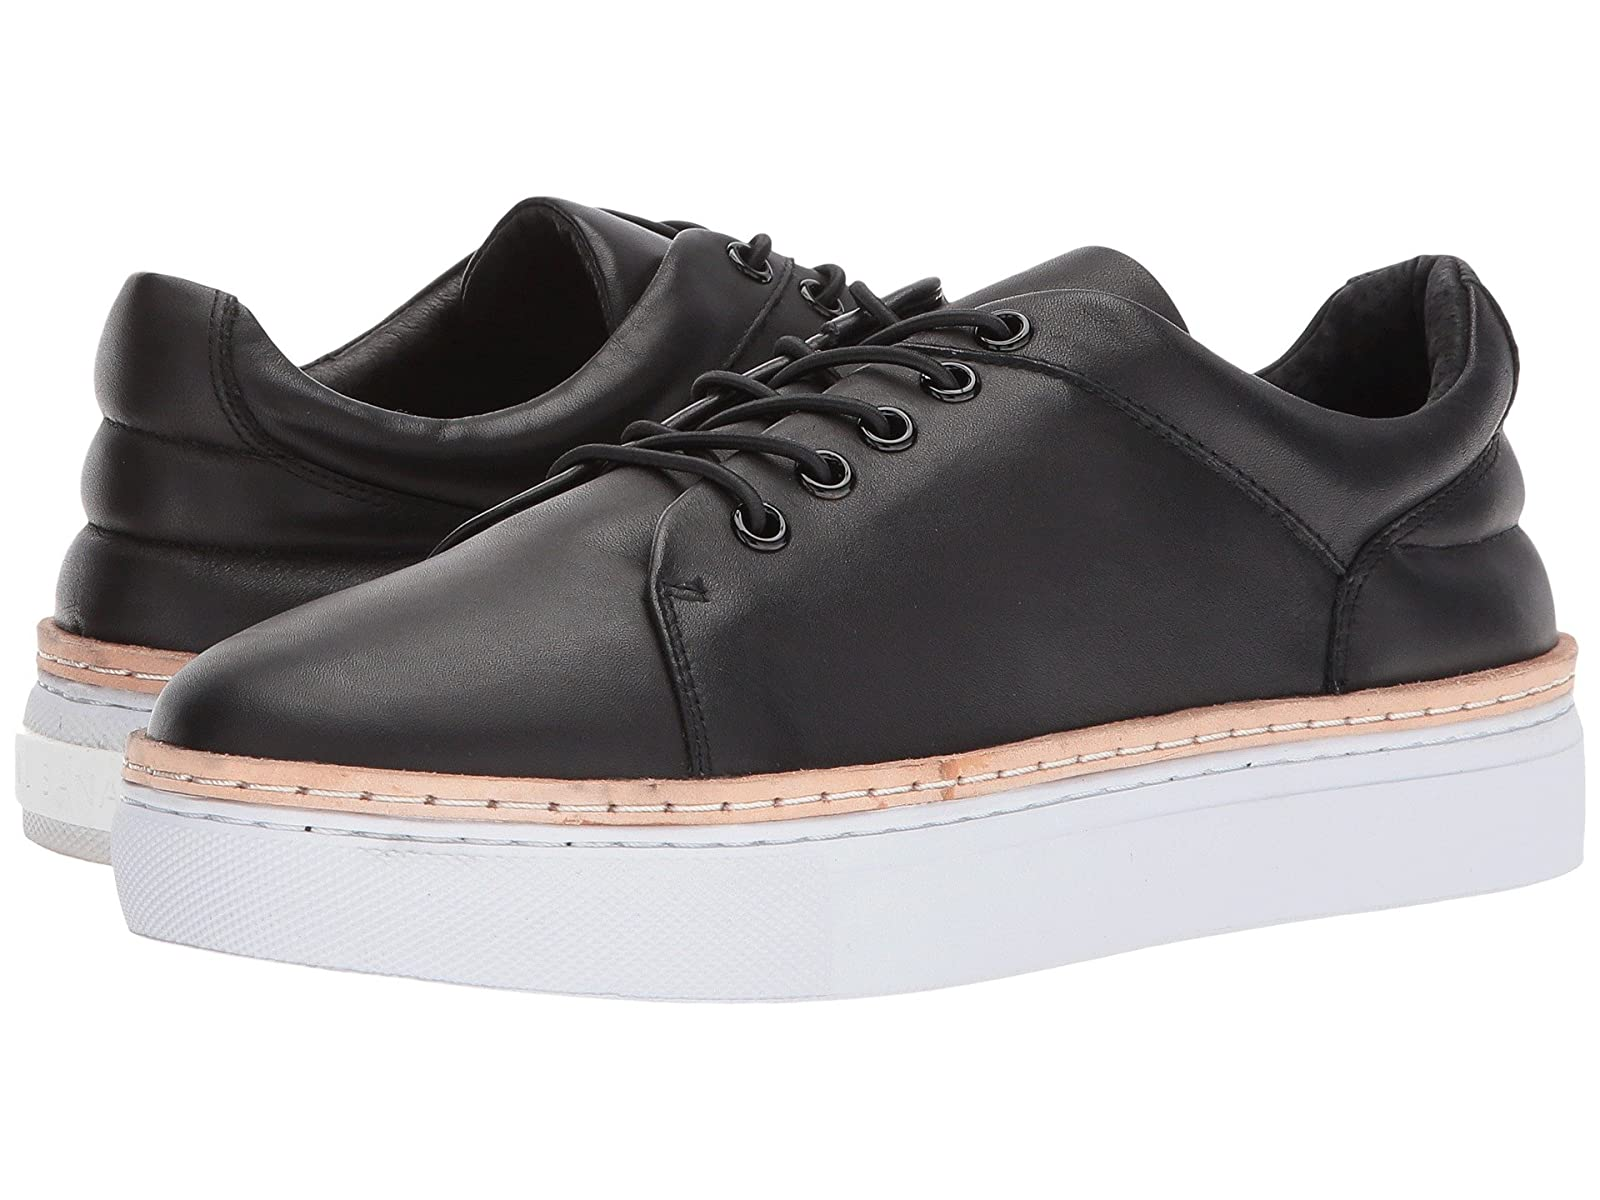 Sol Sana Jupiter SneakerCheap and distinctive eye-catching shoes